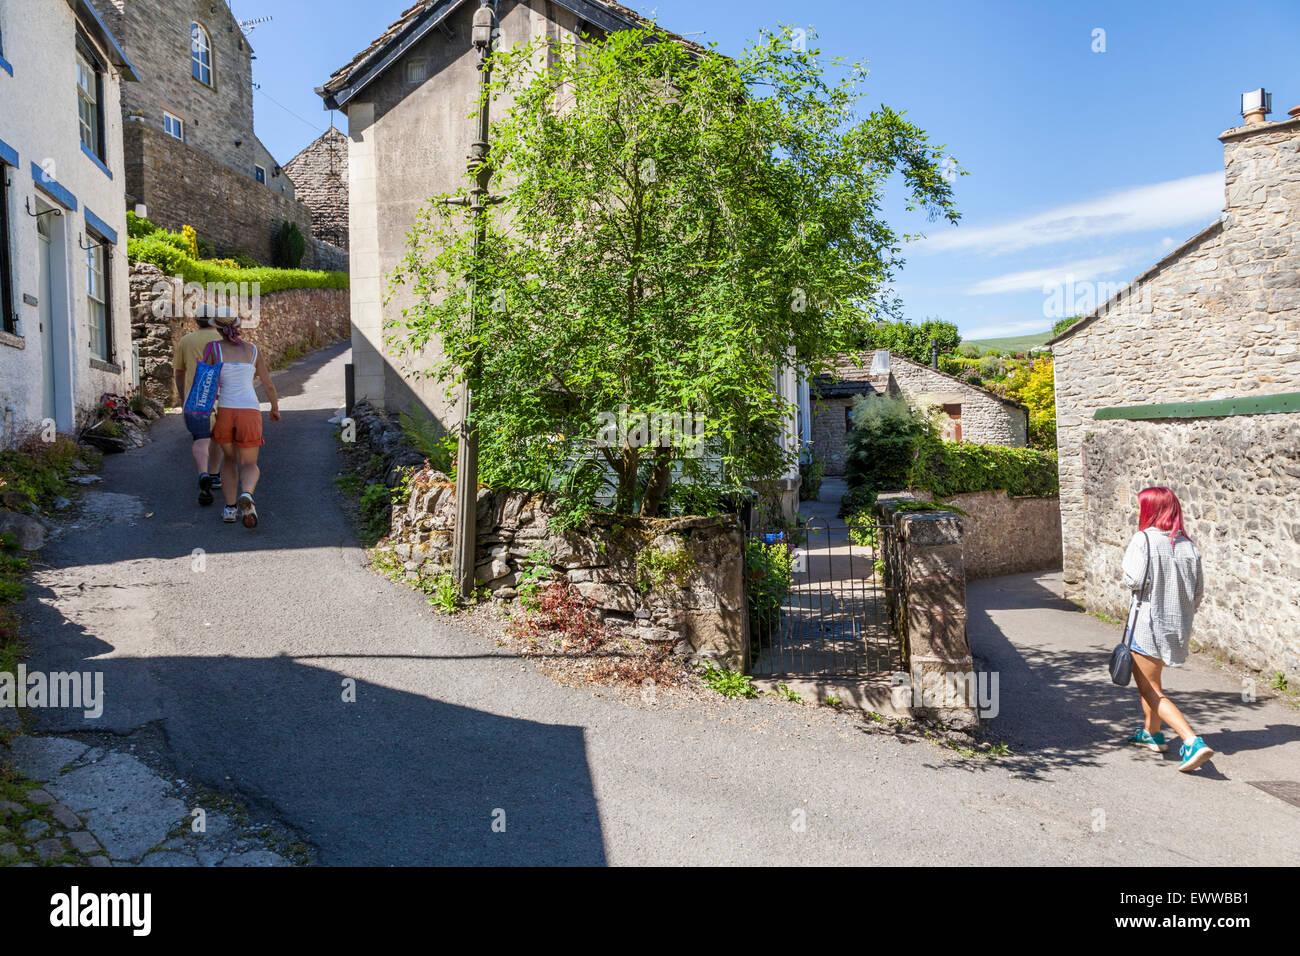 People walking along an English village lane in Summer. Castleton, Derbyshire, Peak District National Park, England, - Stock Image